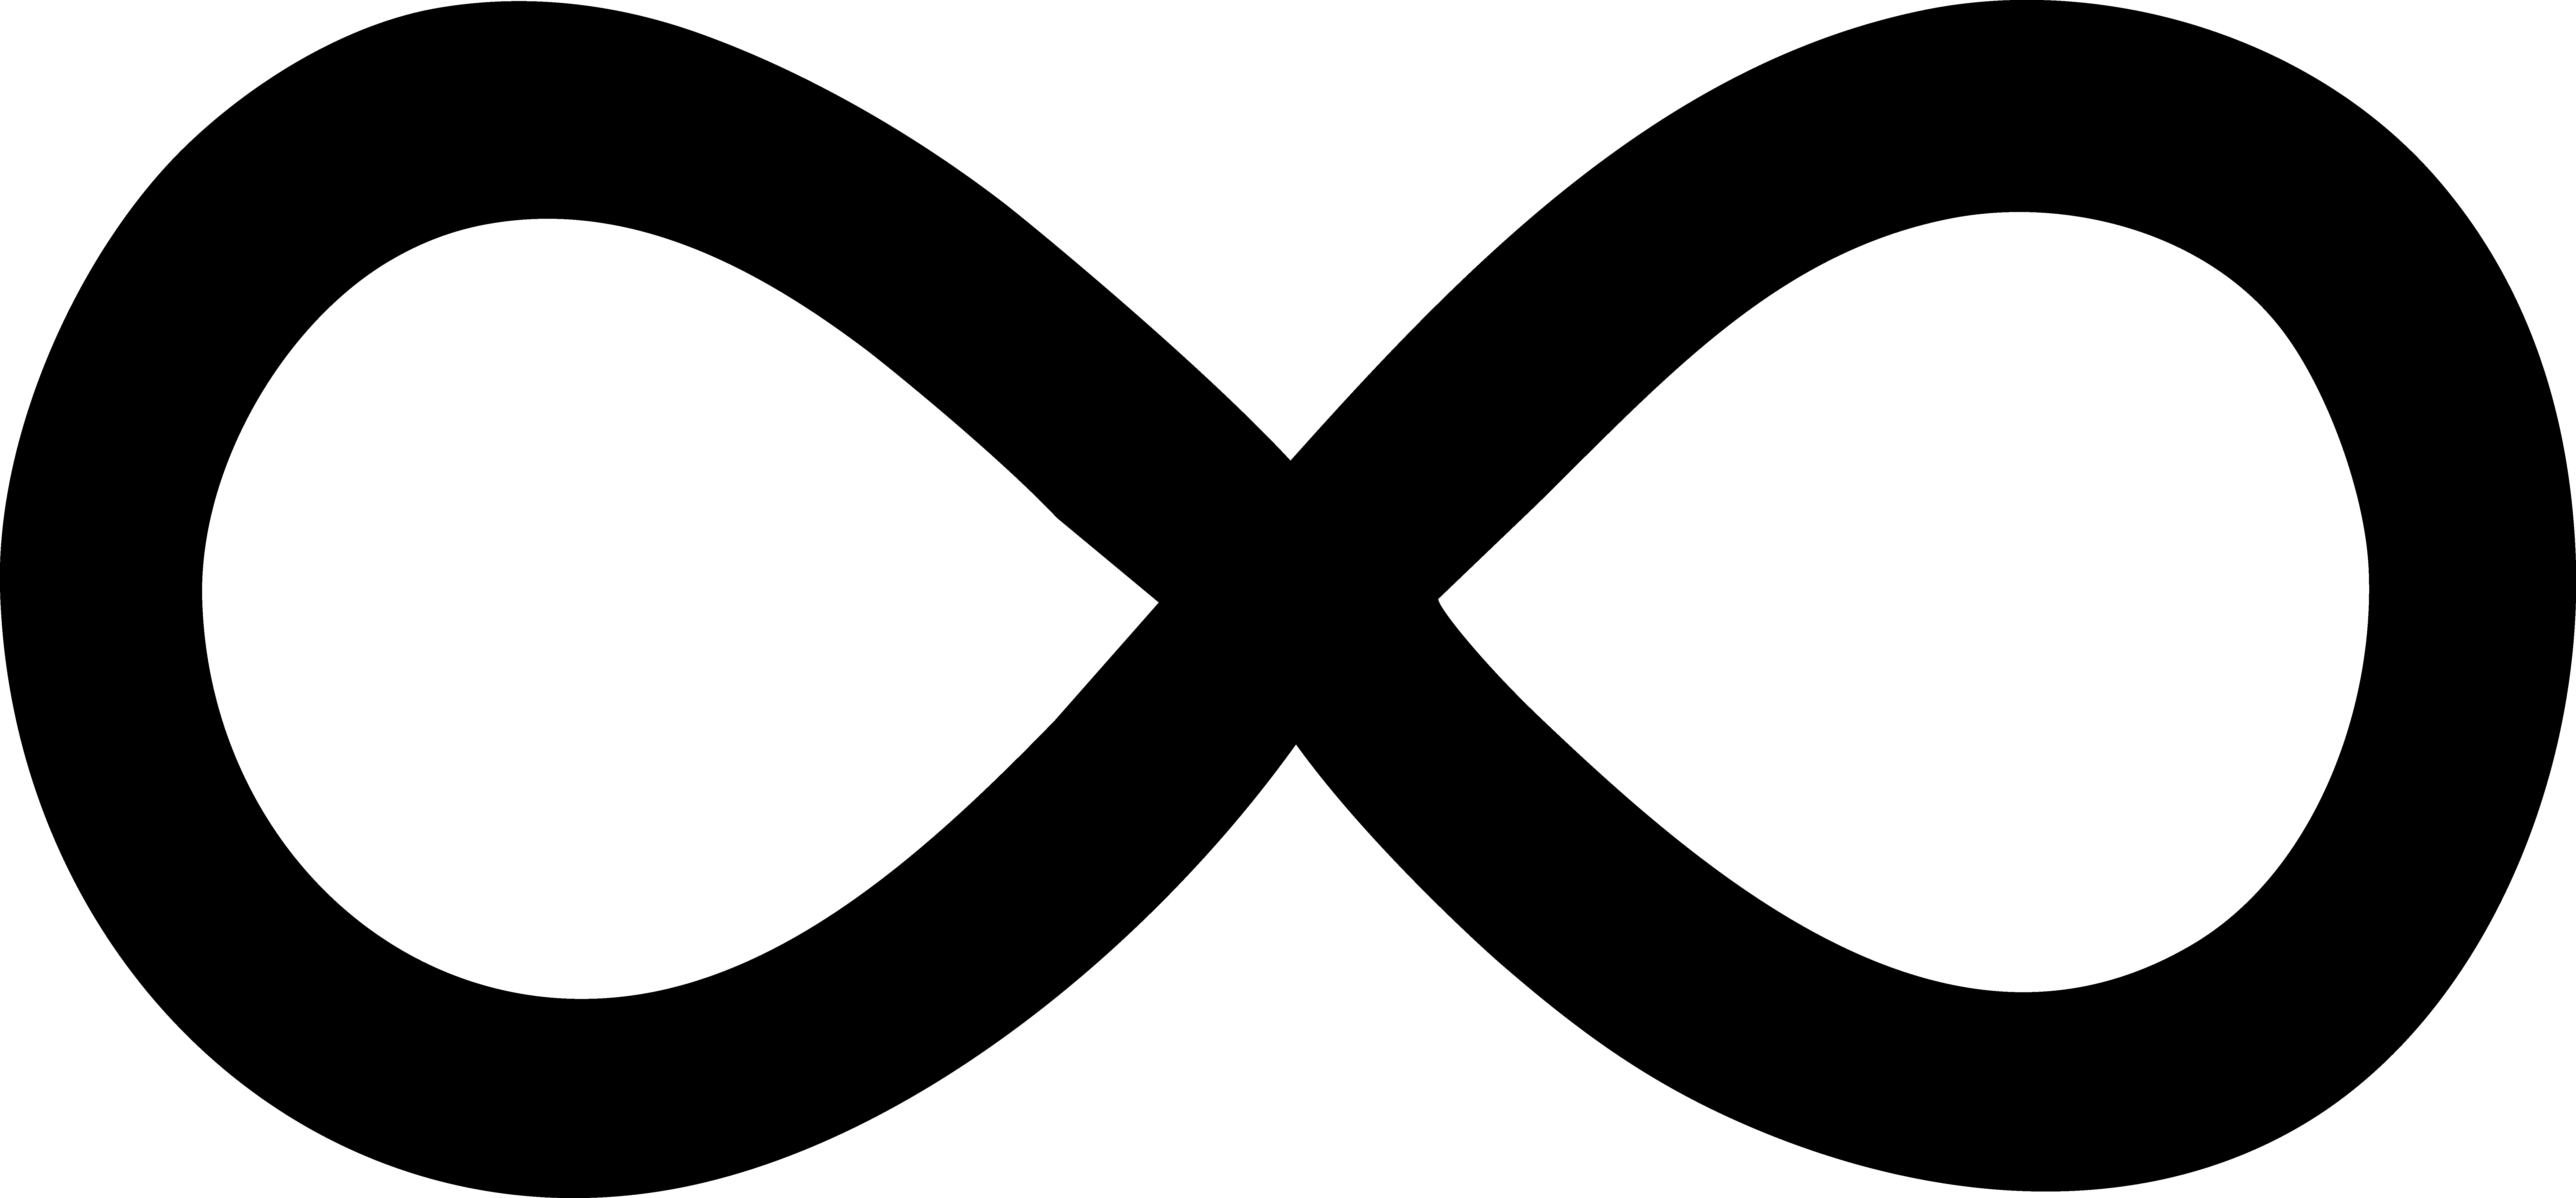 9903x4605 Infinity Symbol Clip Art